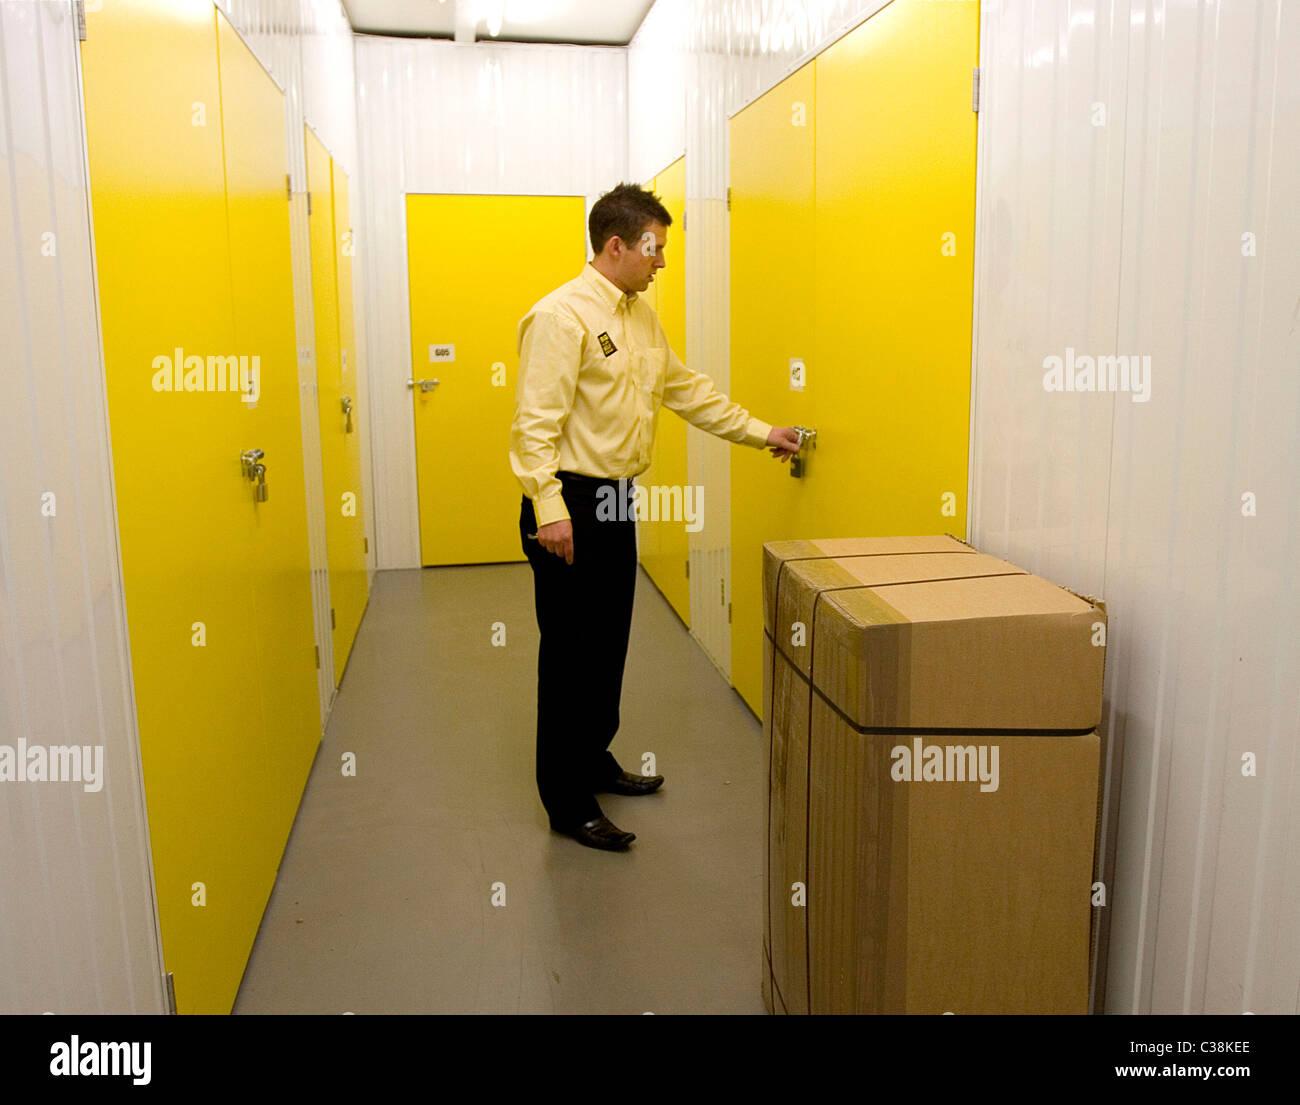 Illustrative image of a Big Yelllow Storage warehouse, London. - Stock Image